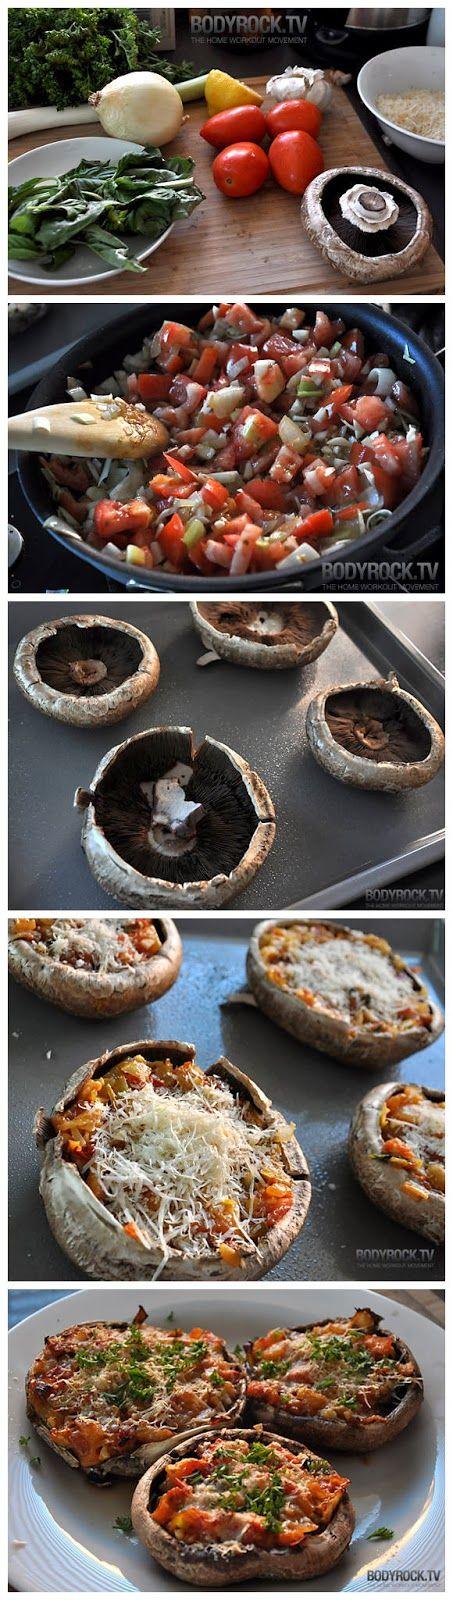 Normal Recipe: Delicious & Healthy Pizza Recipe with Portabello Mushrroms.  Omit the cheese to make paleo.